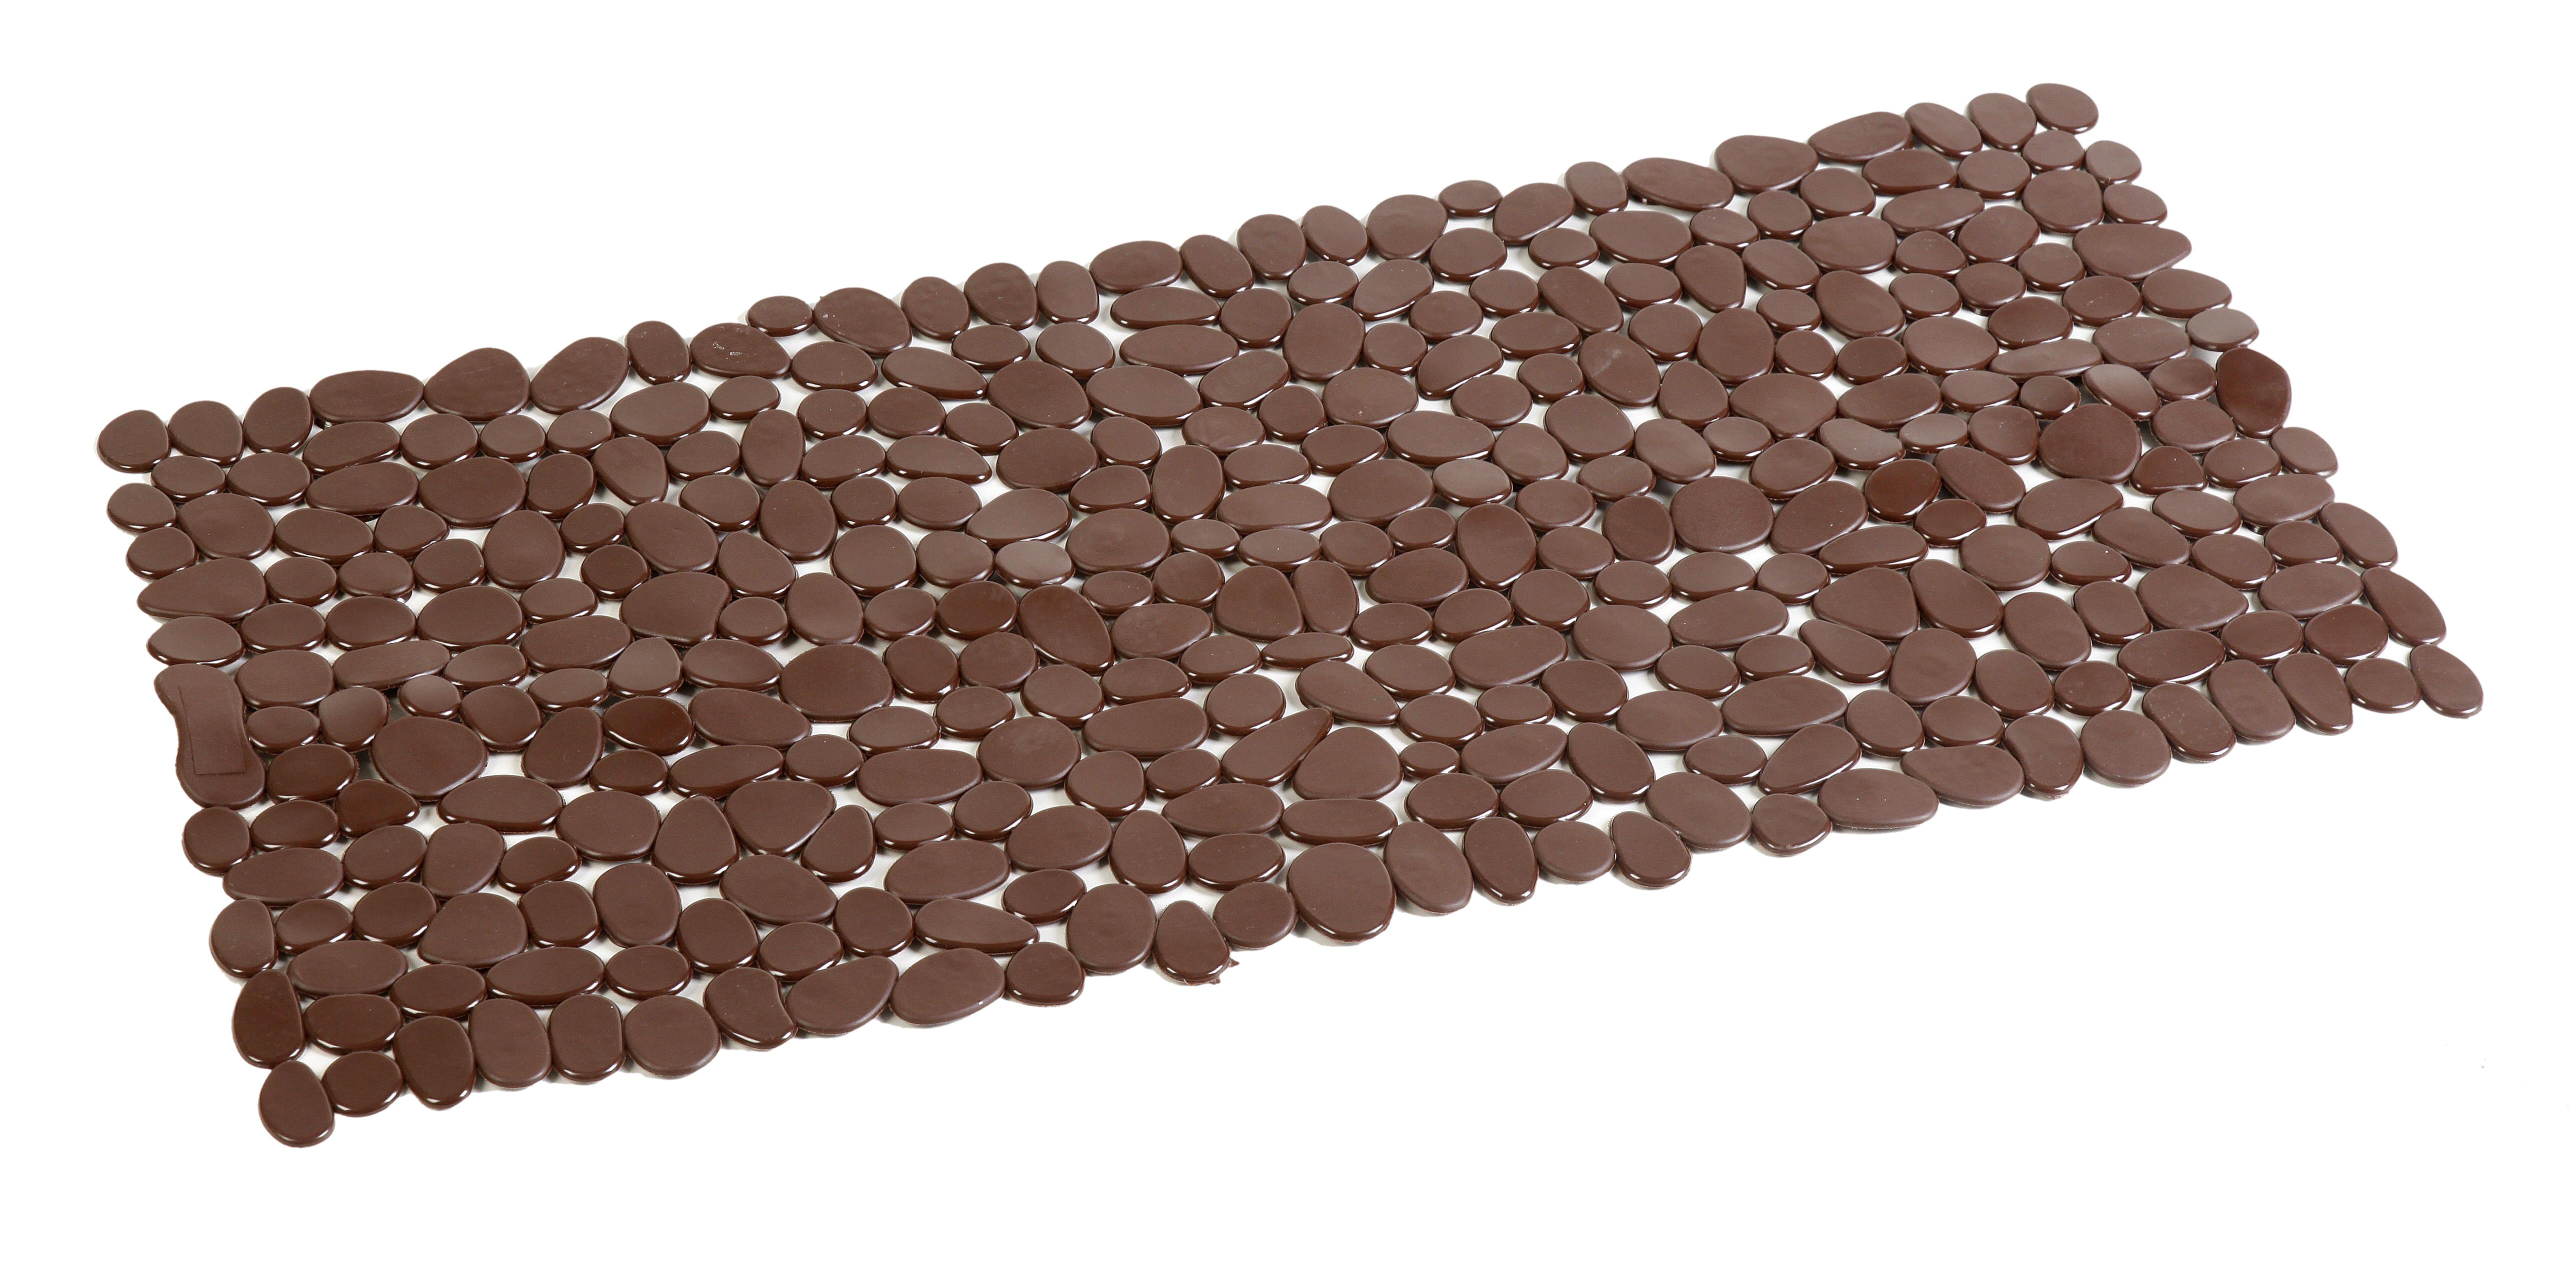 Covor antiderapant dreptunghiular 88x40cm din PVC maro AWD02090808